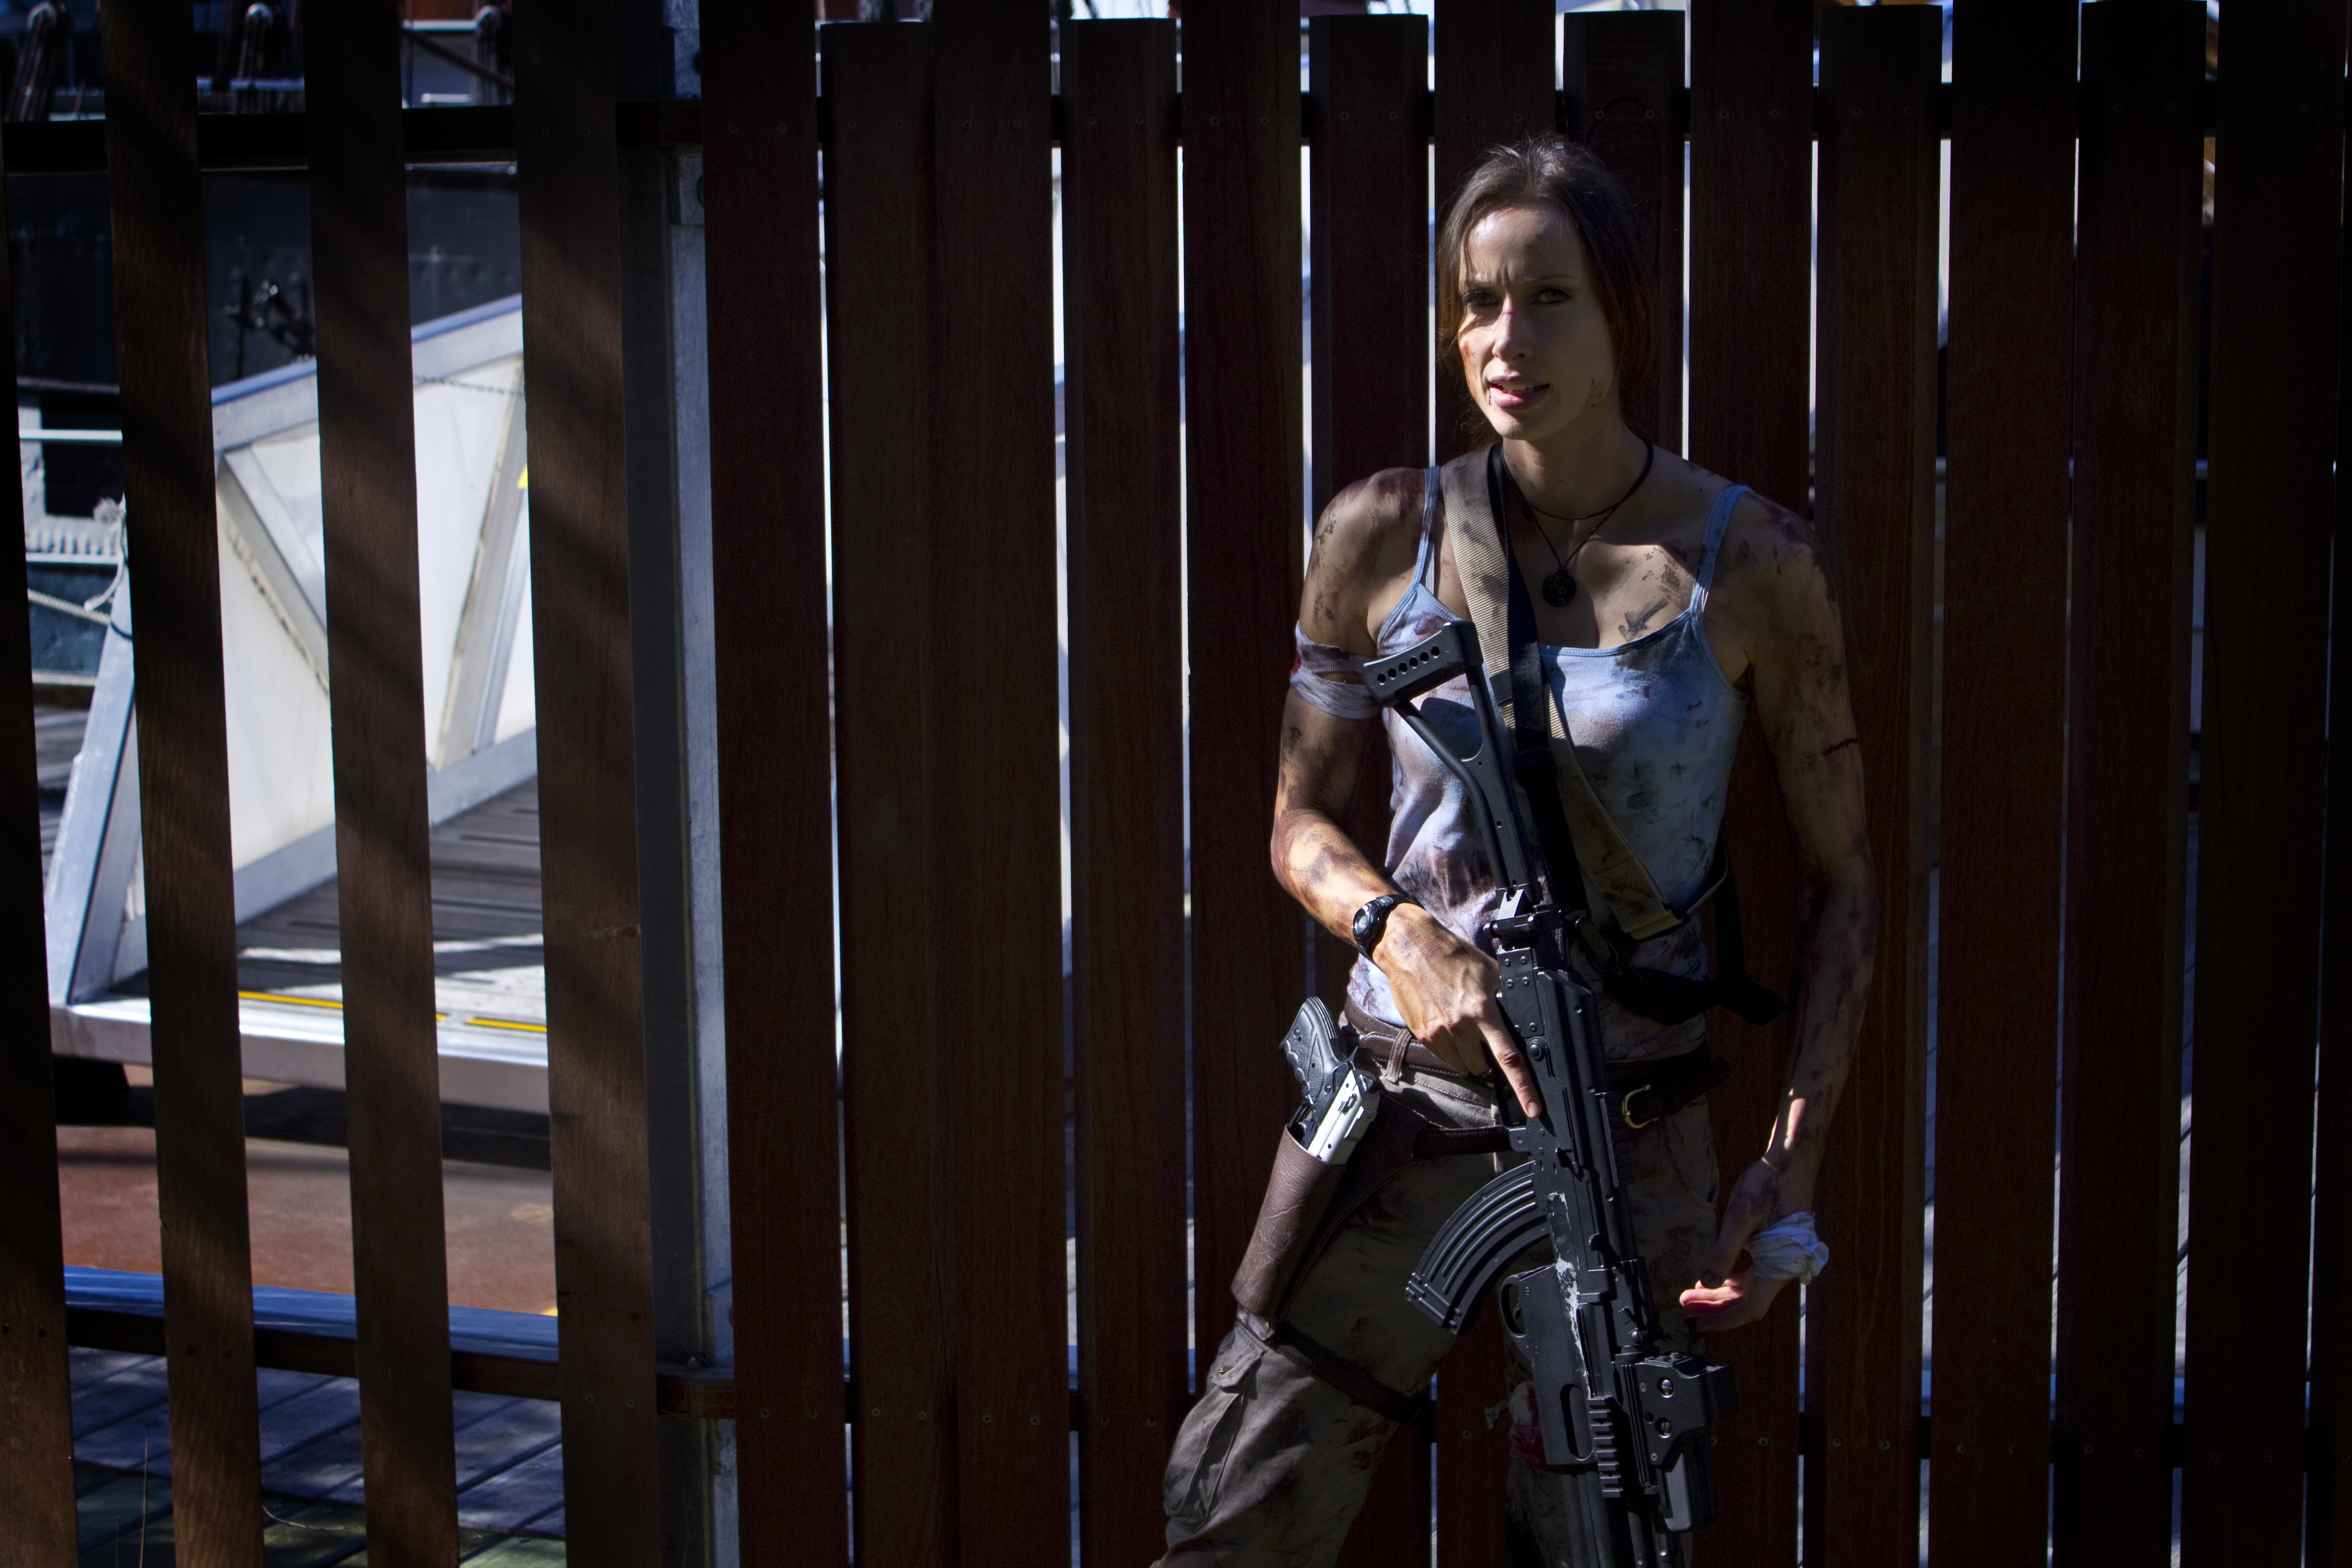 Lara Croft - Rest by ShonaAdventures